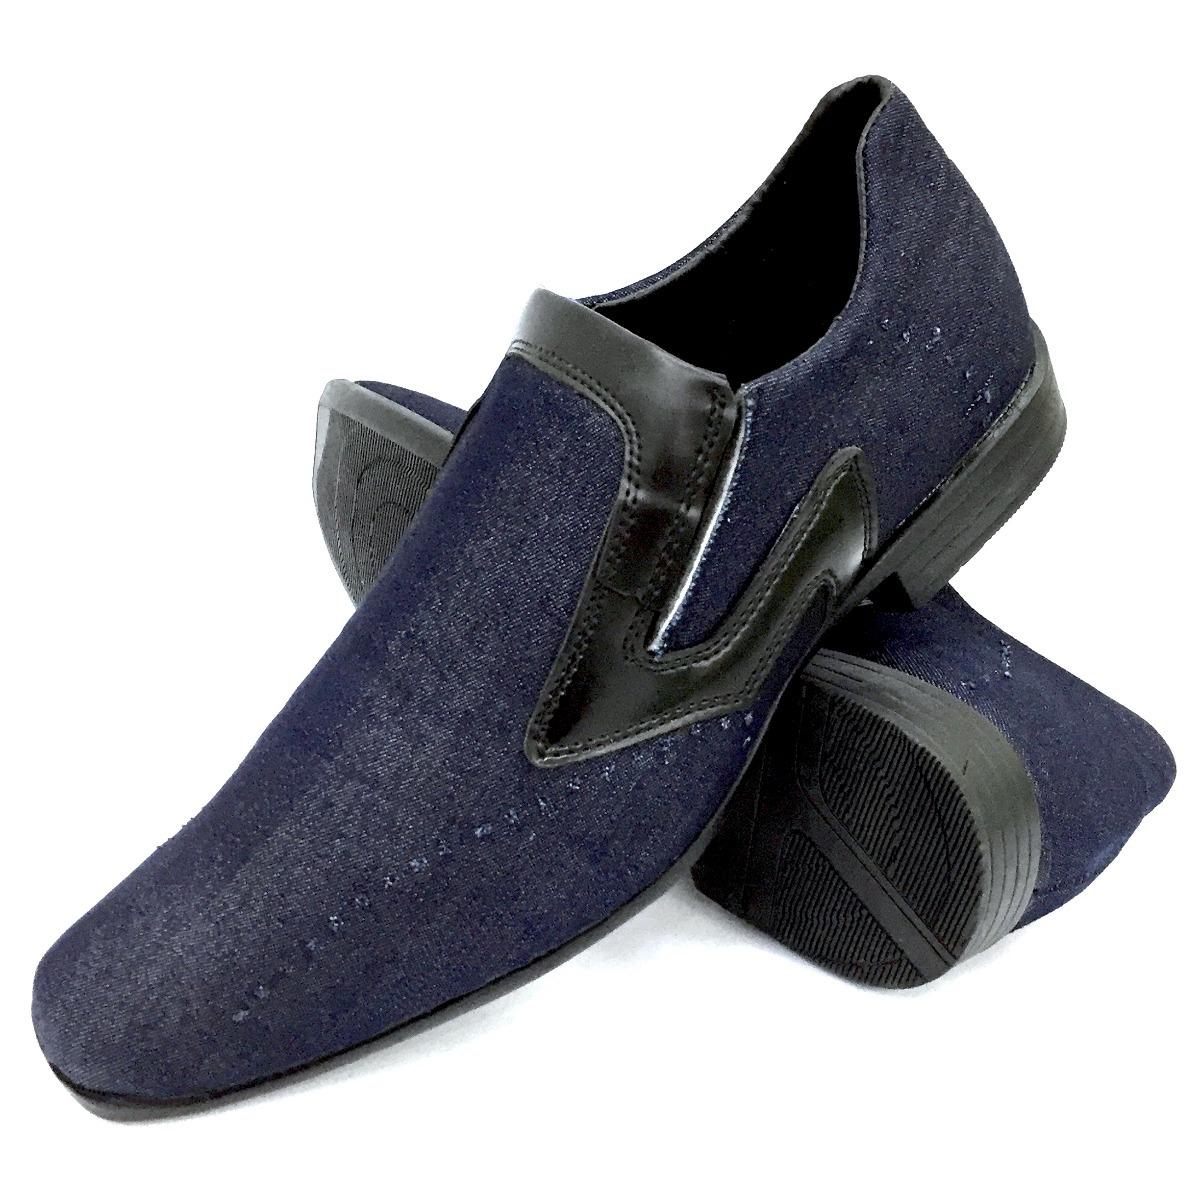 5a6e0d1af sapato jeans social masculino calce fácil muito barato mesmo. Carregando  zoom.